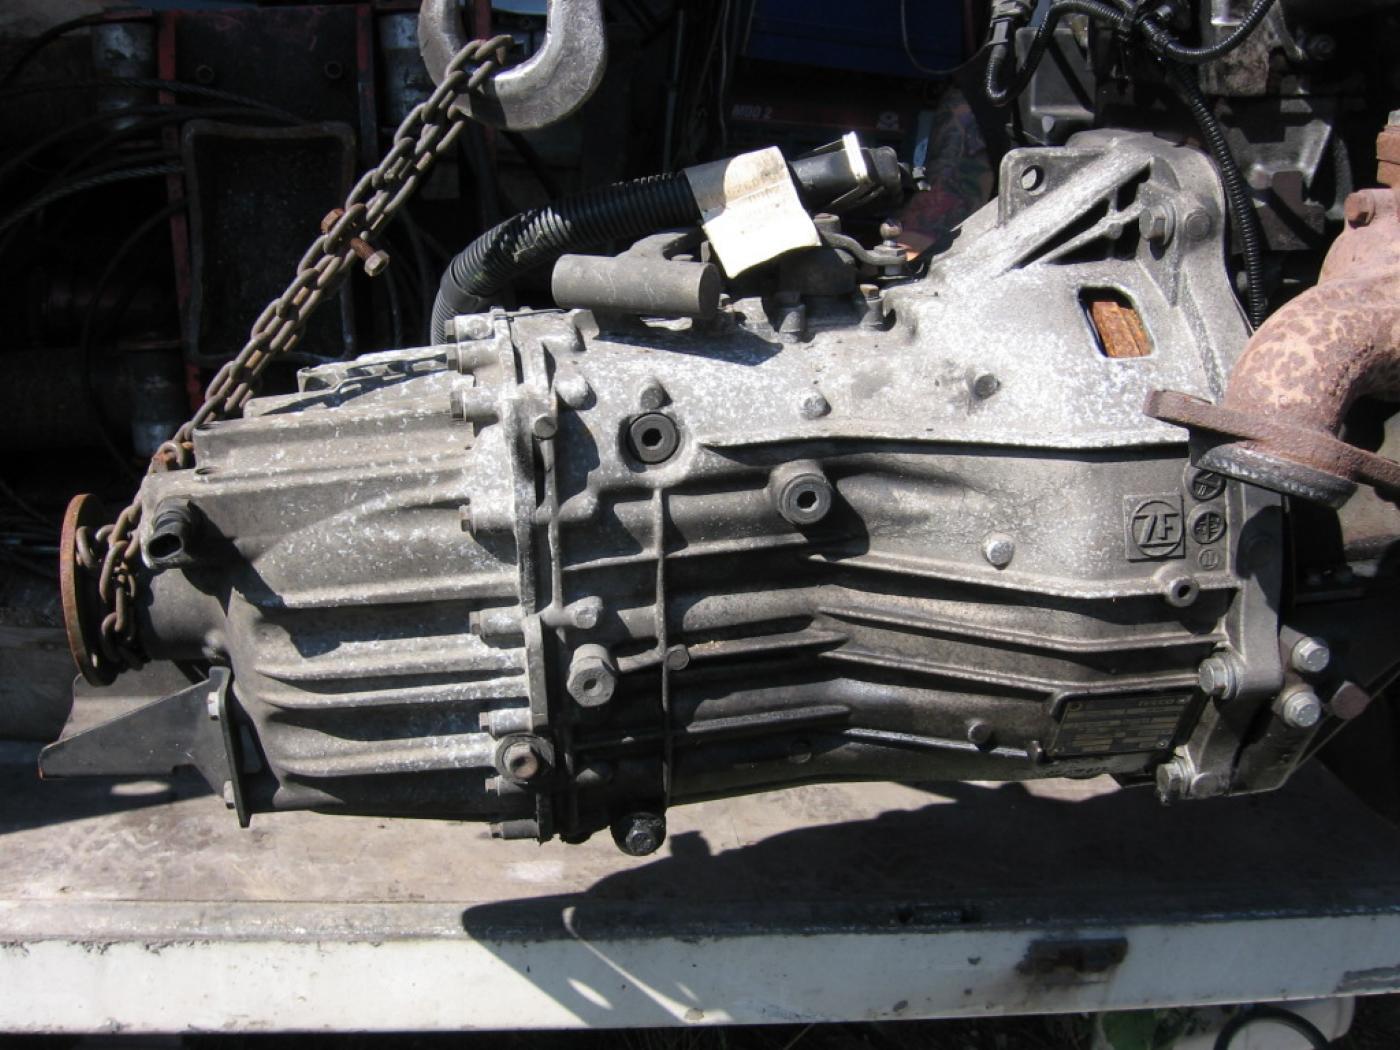 Iveco Daily 50 C13 - převodovka ZF 6S 300 Daily 50 C13- převodovka ZF 6S 300